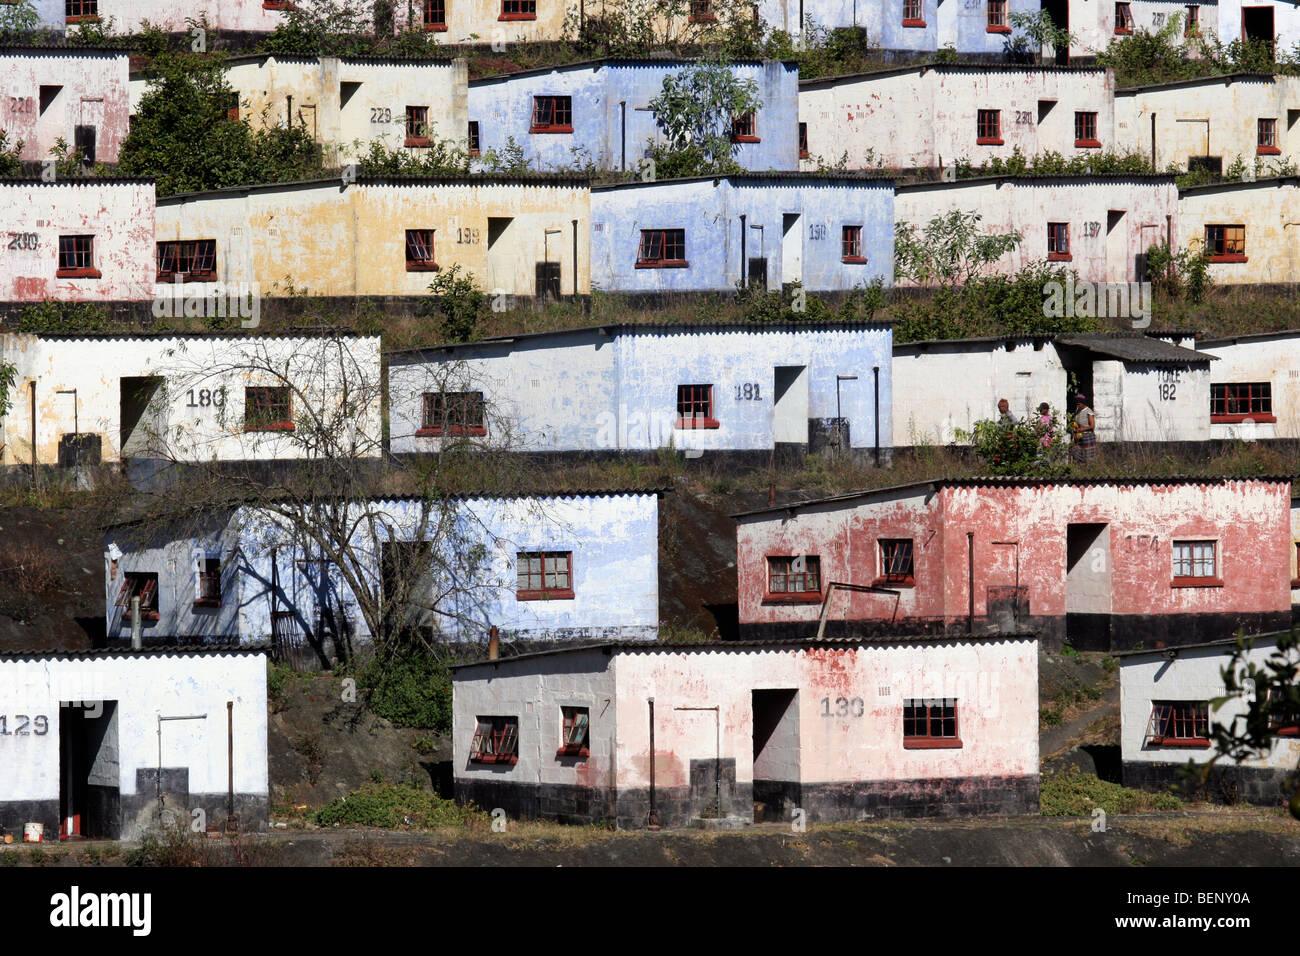 Swaziland Modern Houses